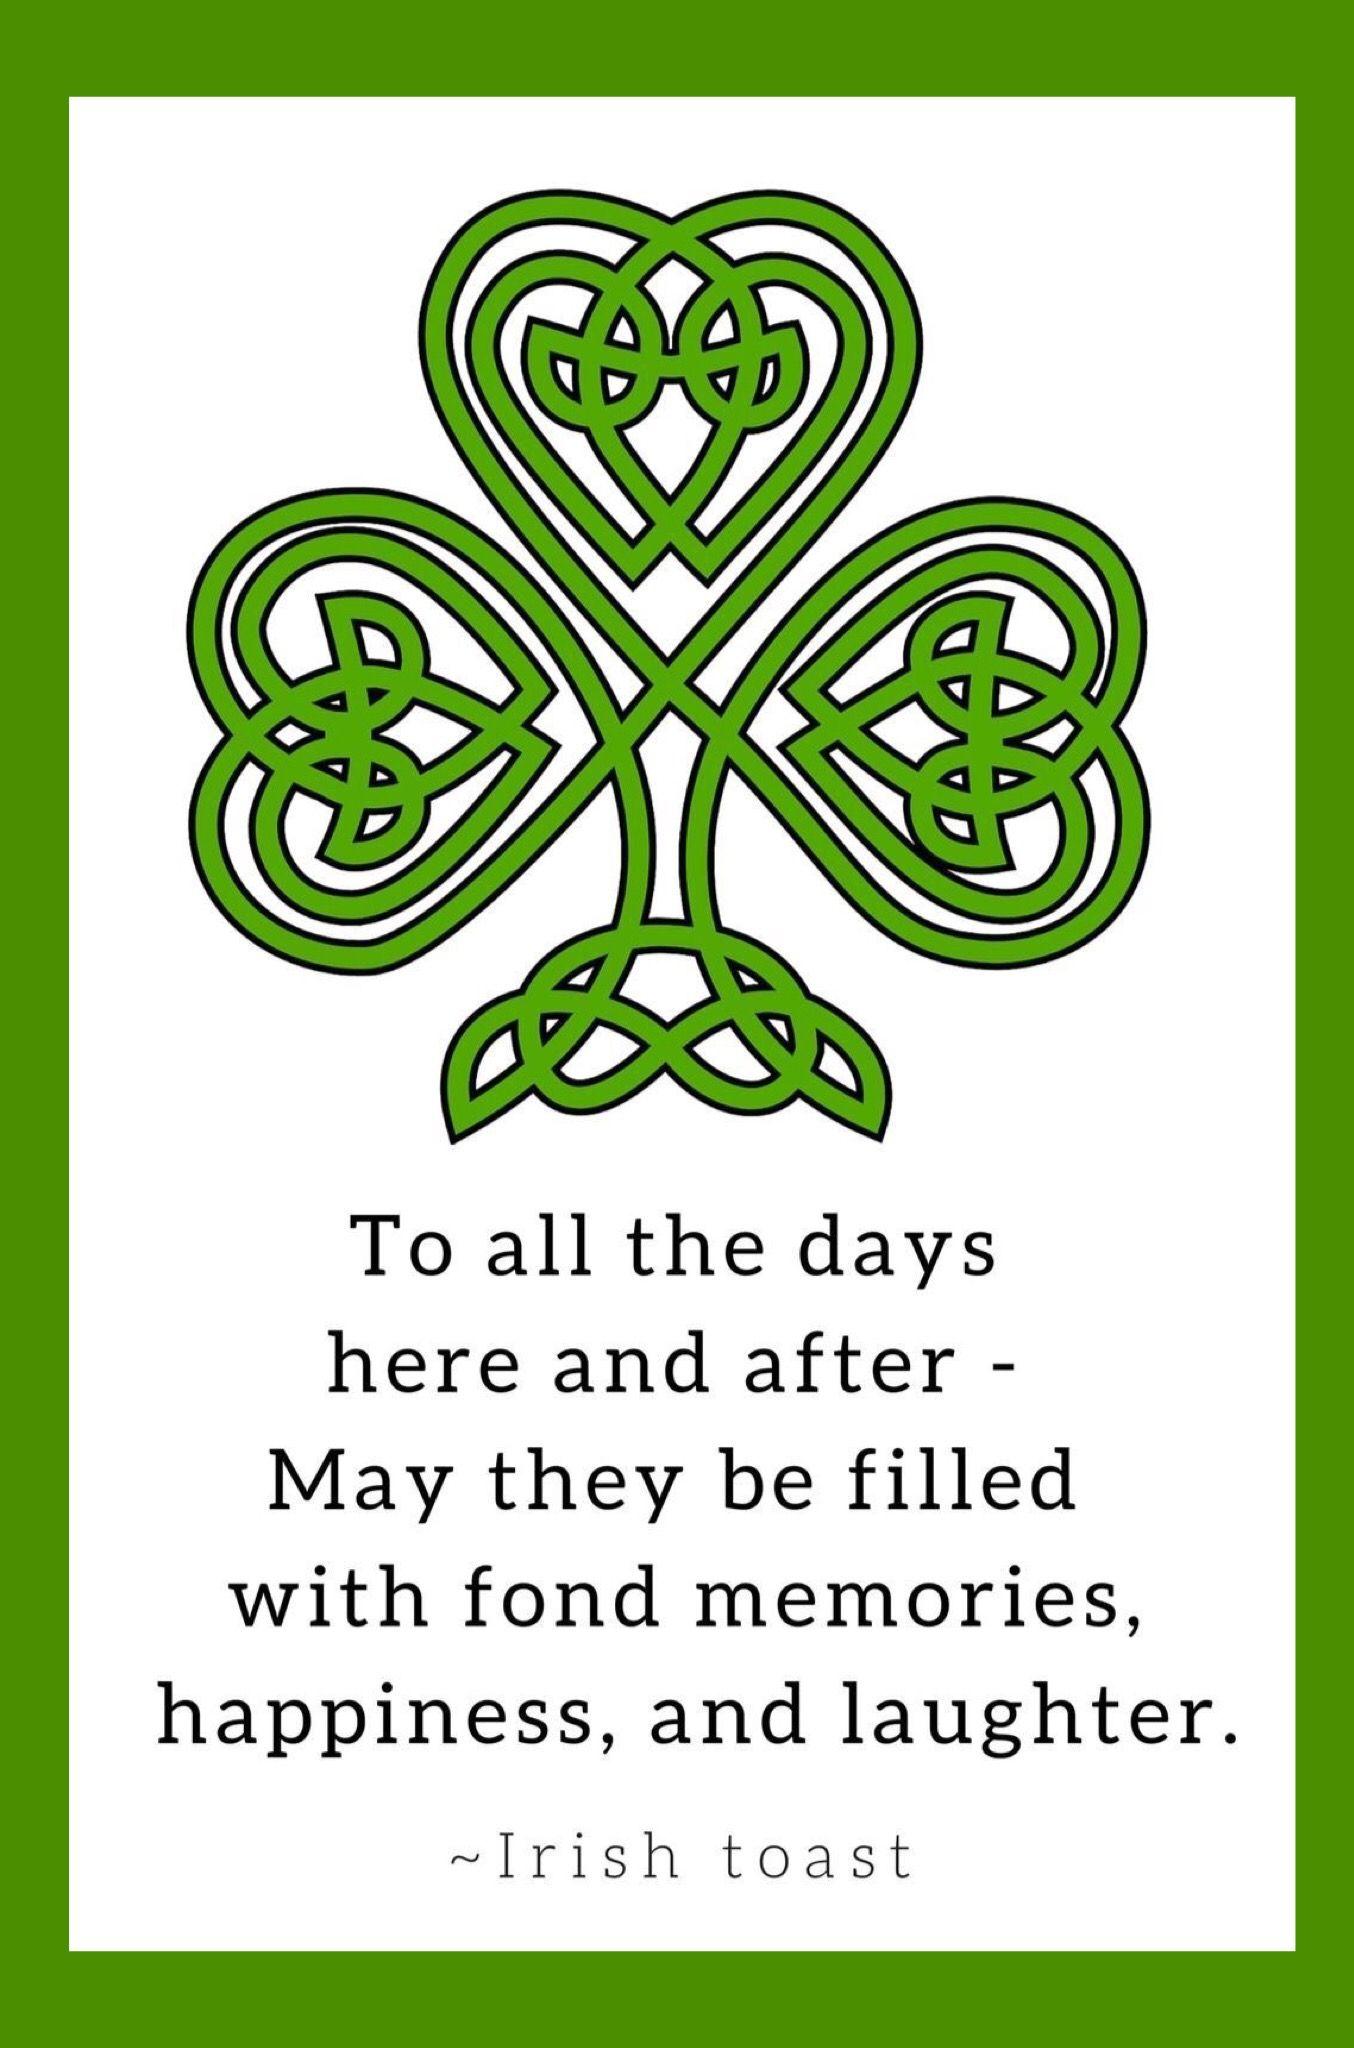 Pin By Bobbie Lemon On Birthday Cards Pinterest Irish Proverbs